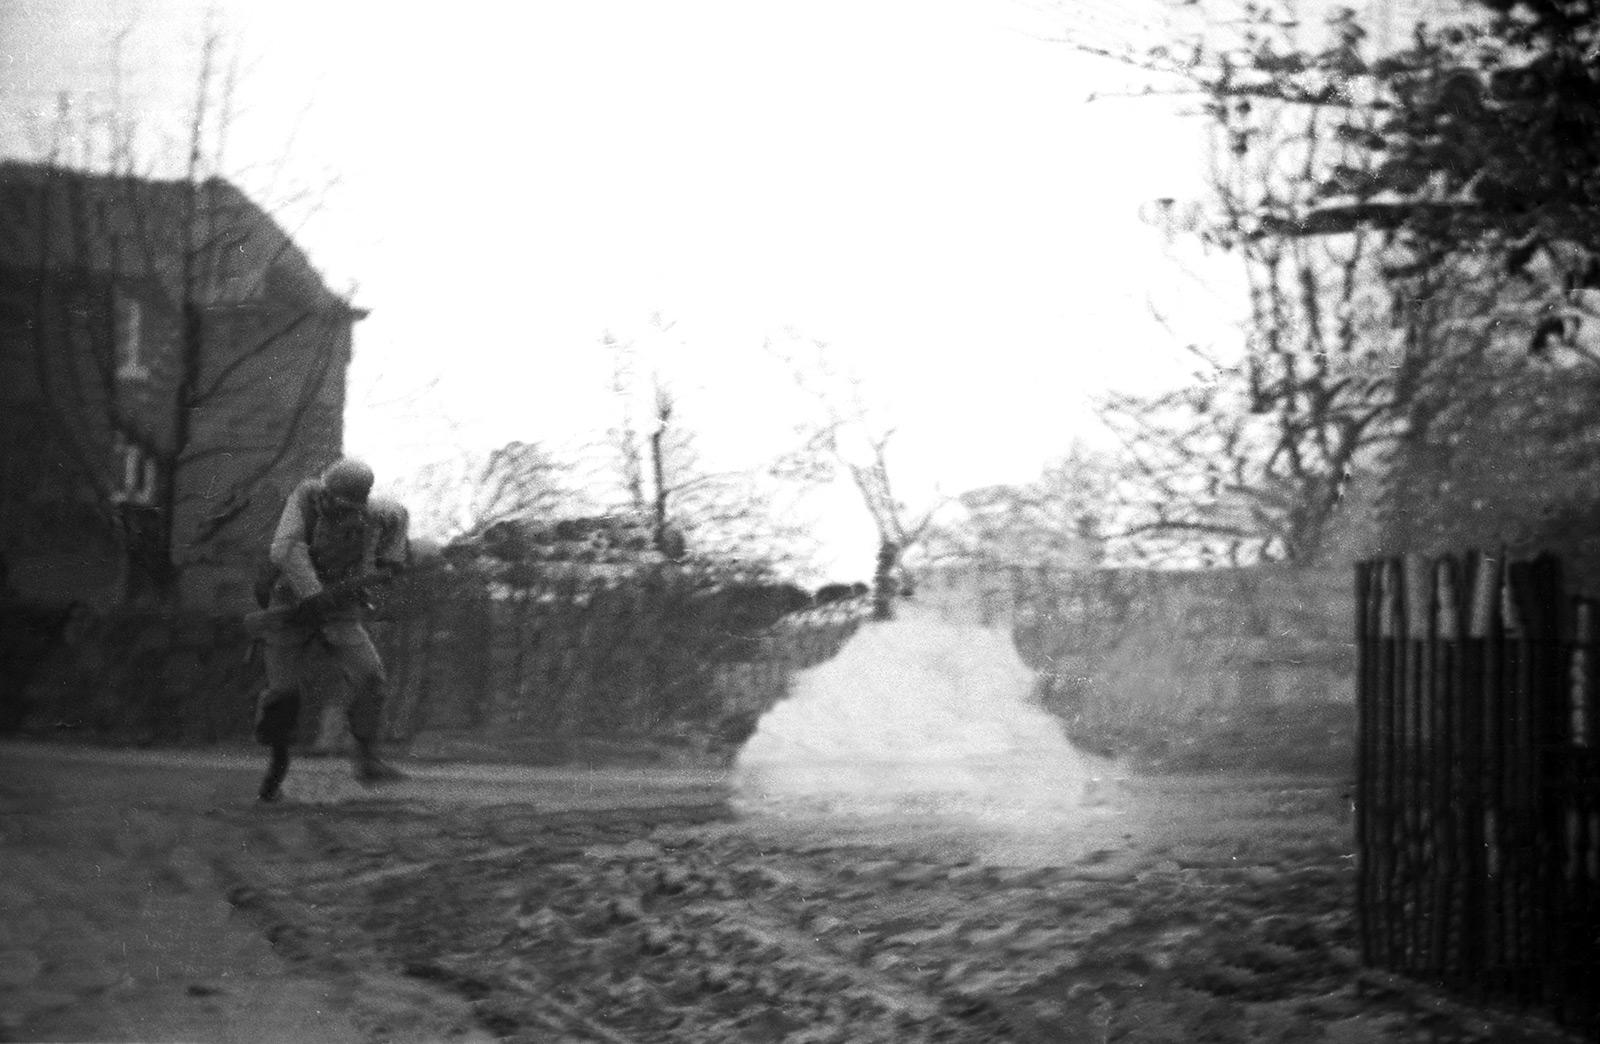 05_jack_w_rose_utolso_lepese_bihain_belgium_1945_januar.jpg